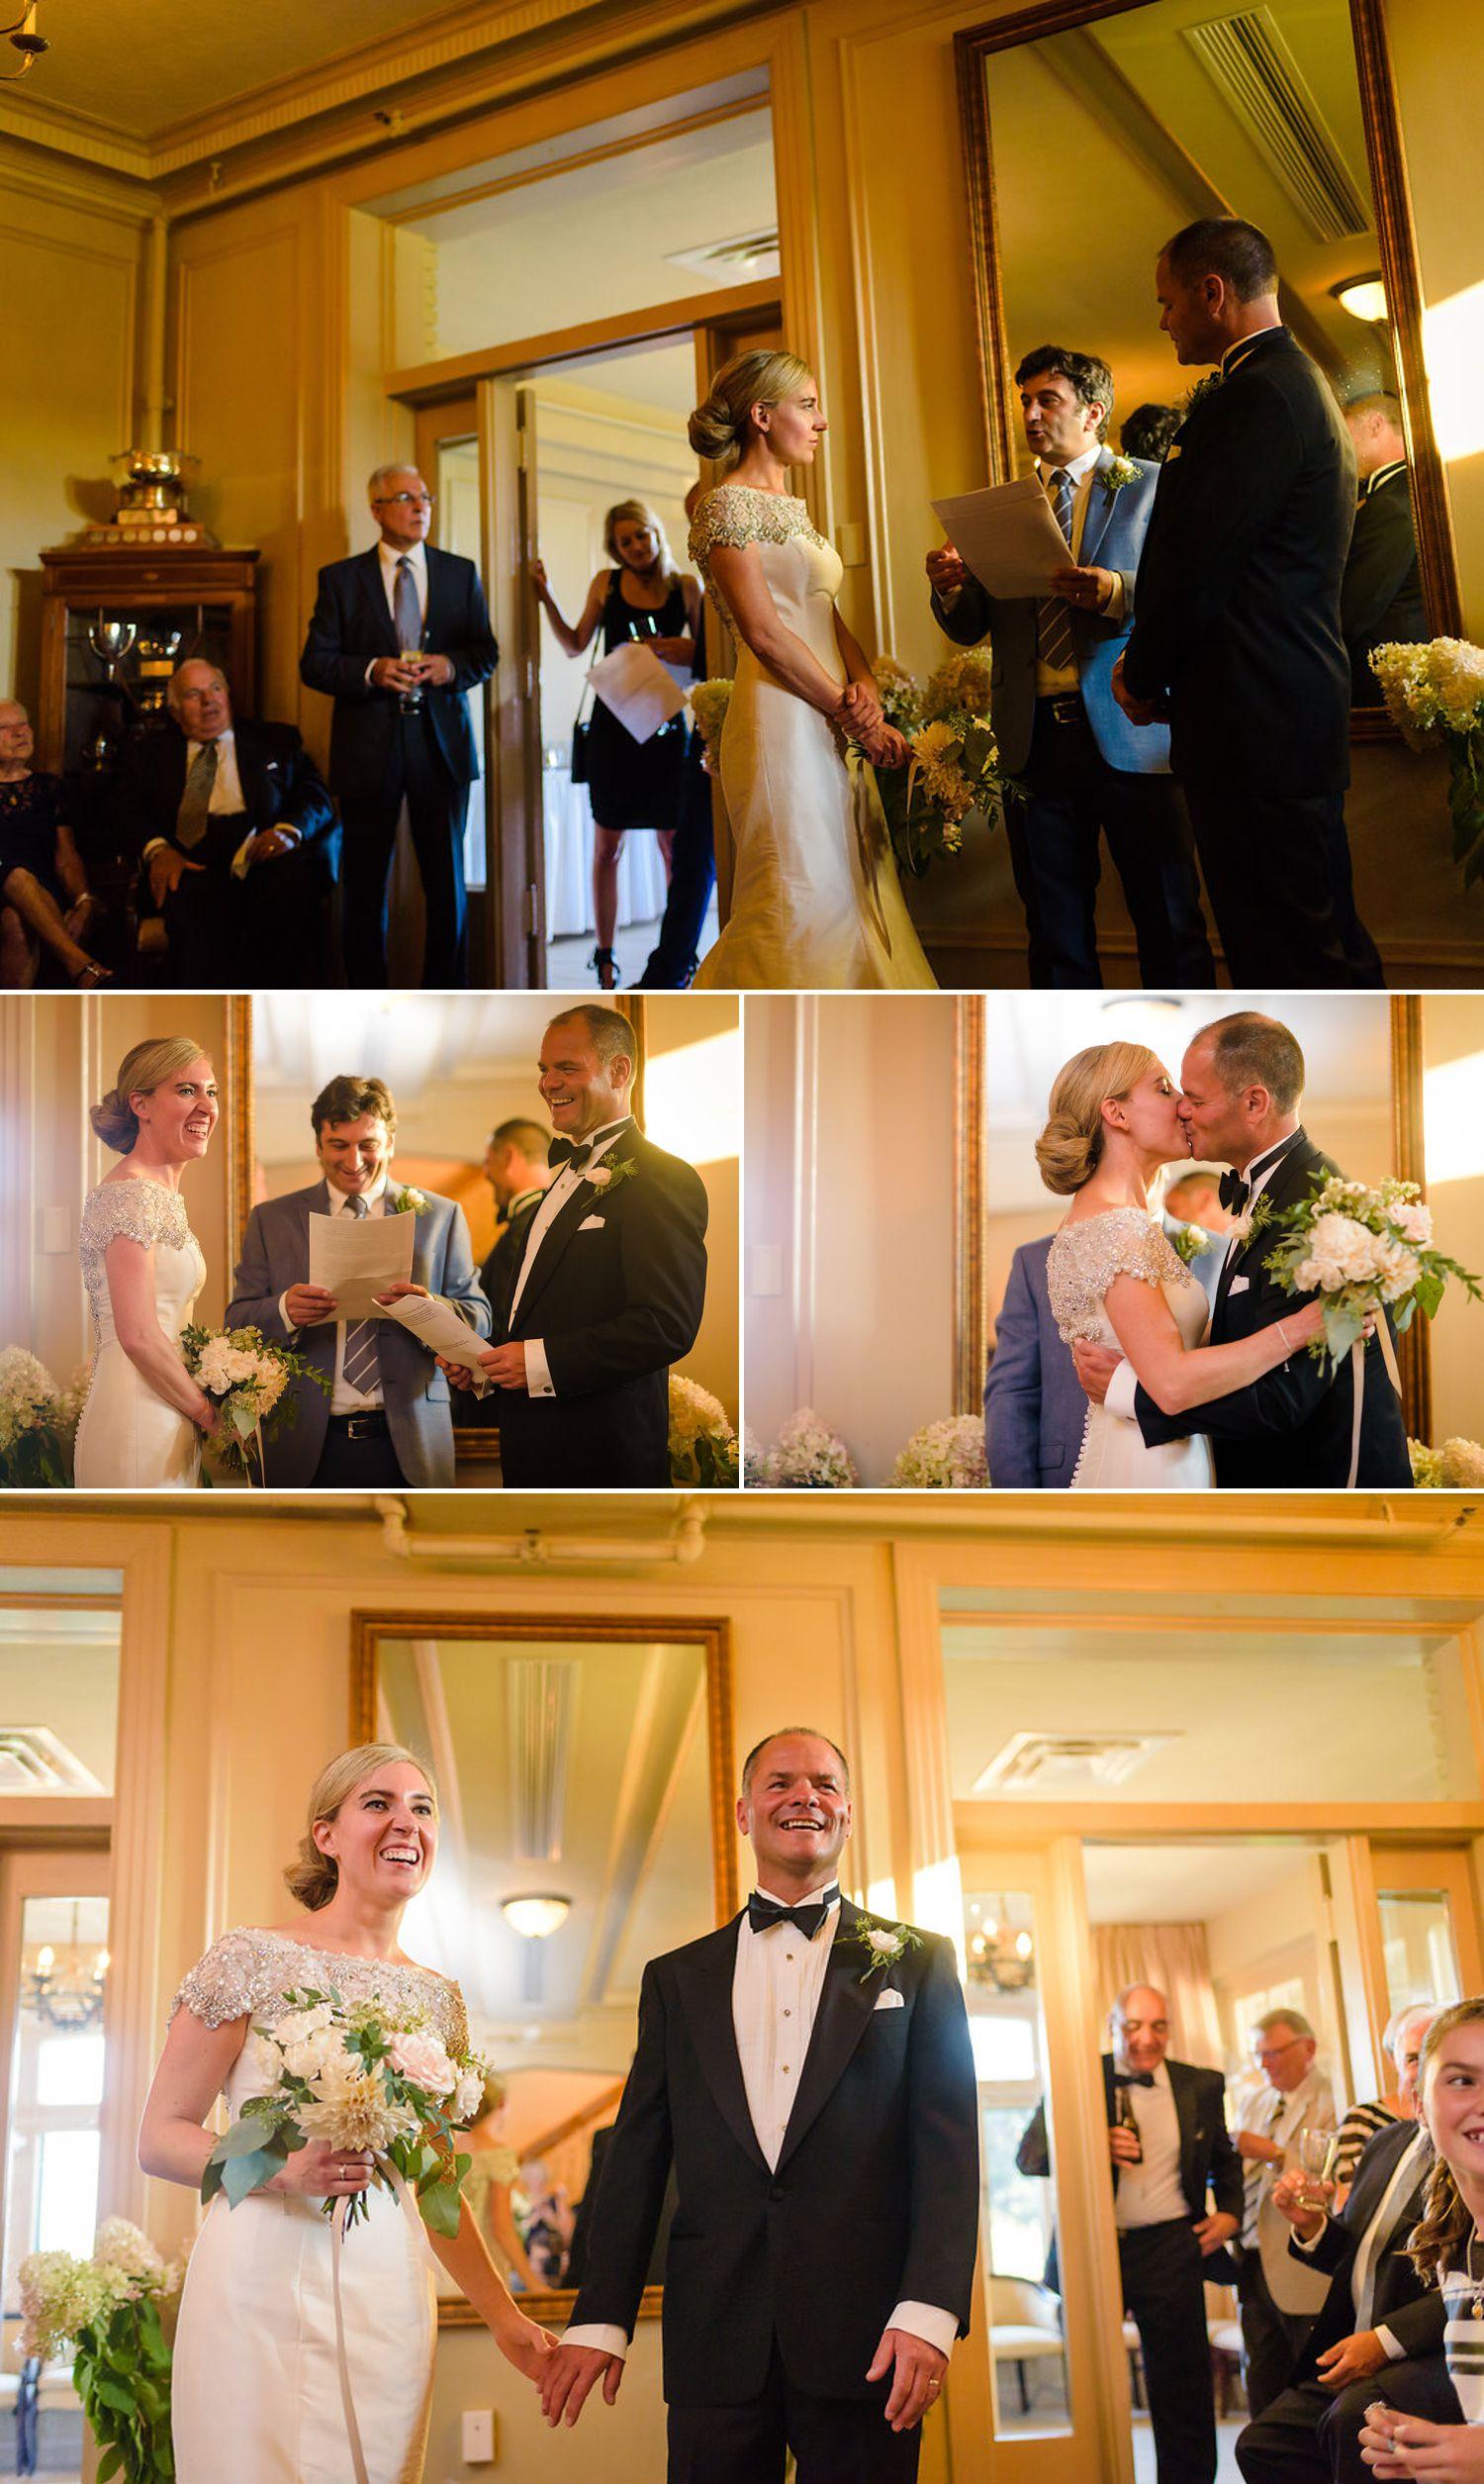 photographs of an indoor wedding at the royal ottawa golf club